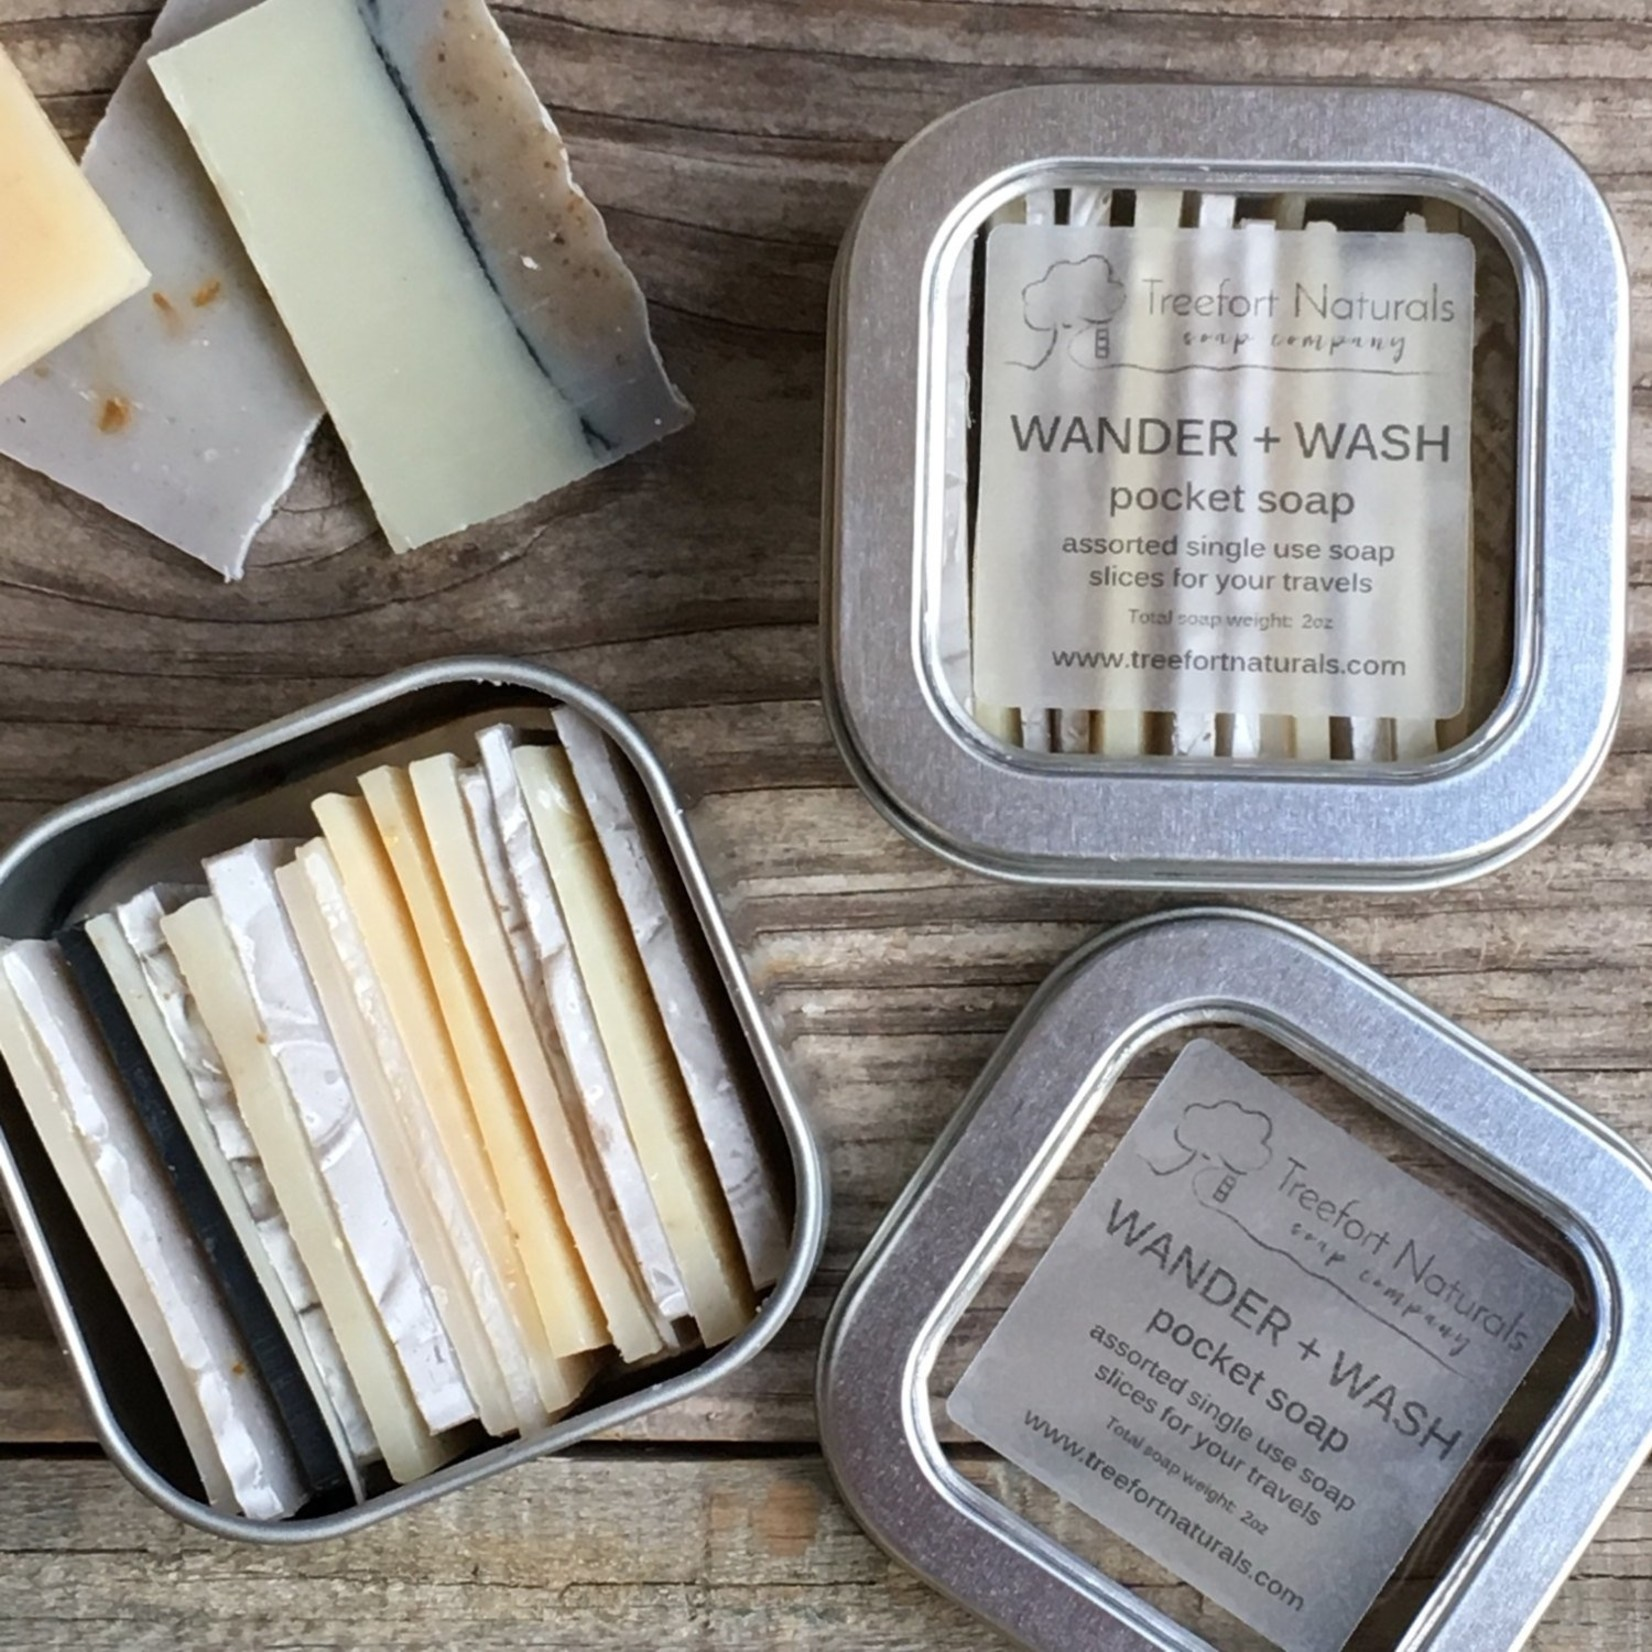 Treefort Naturals Buy Wander + Wash Pocket Soap by Treefort Naturals